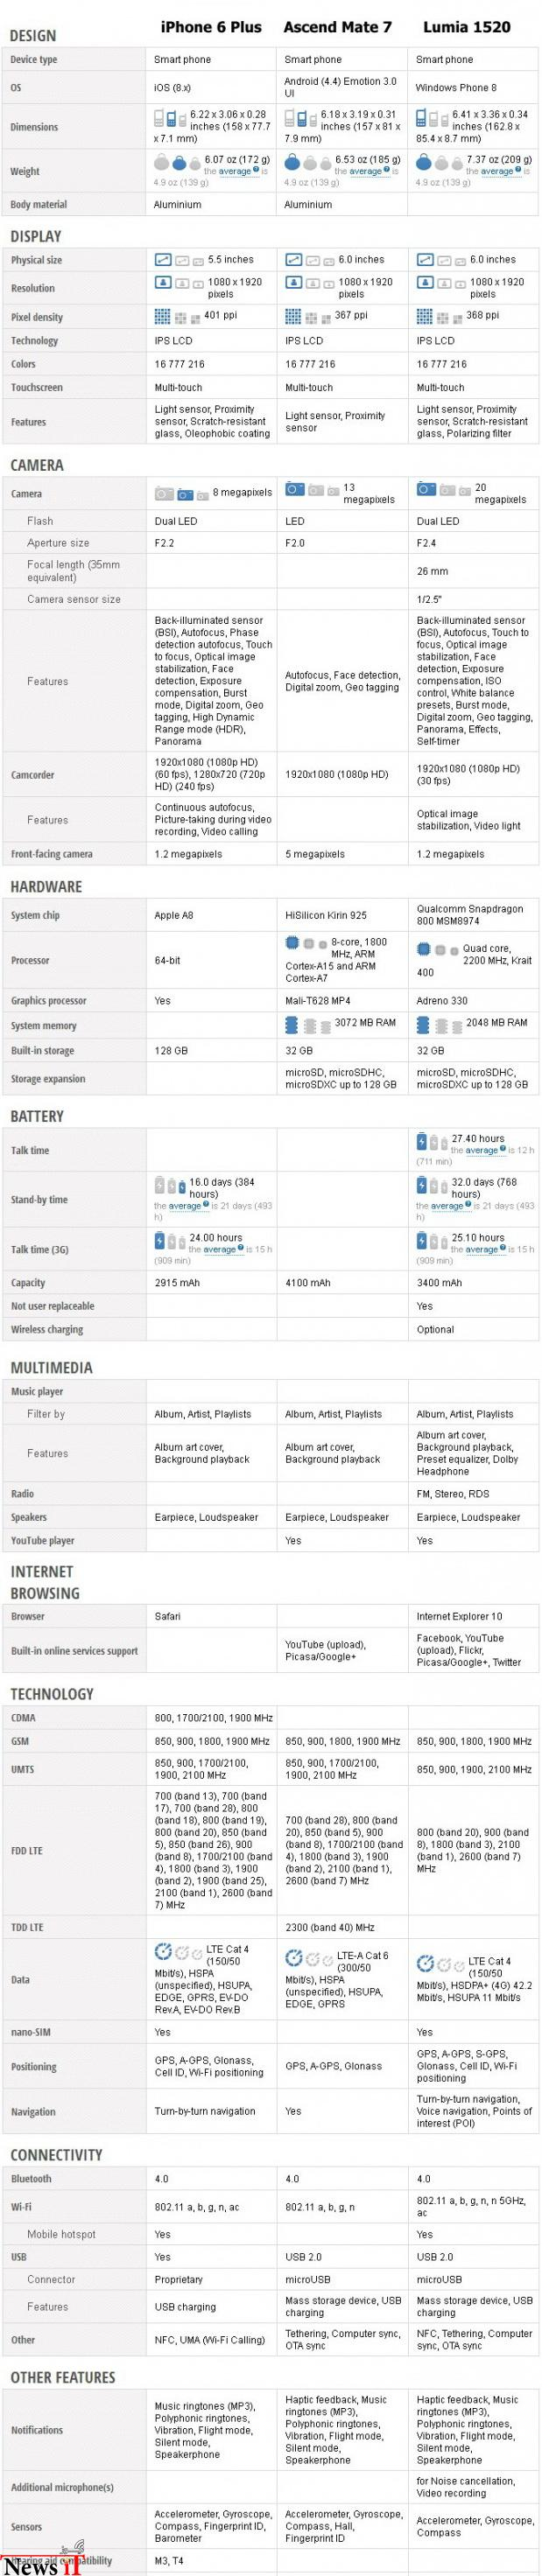 iphone-6-plus-vs-Ascend-Mate-7-lumia-1520-1-620x3216